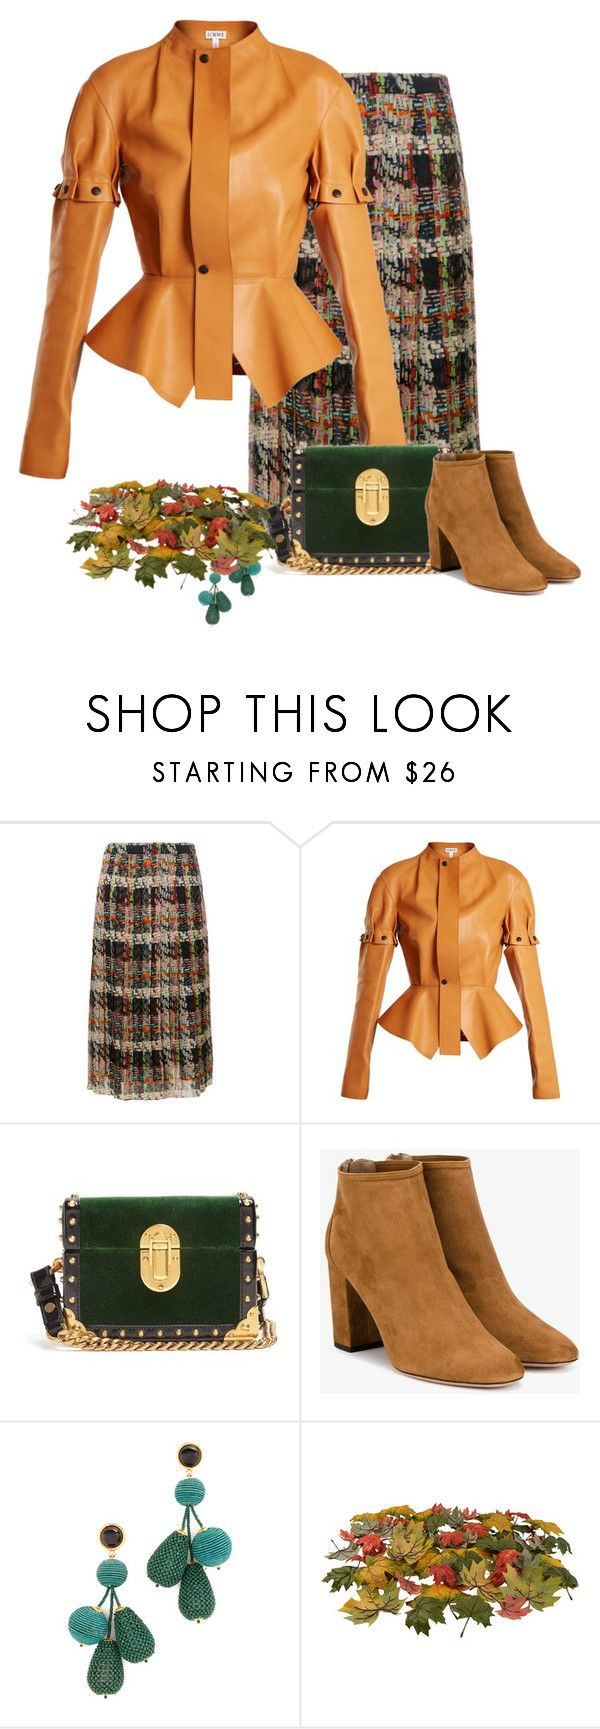 """Plaid pleated skirt"" by gagenna ❤ liked on Polyvore featuring Blumarine, Loewe, Prada, Aquazzura, Lizzie Fortunato, contest, plaidskirt, fallstyle and blumarin"